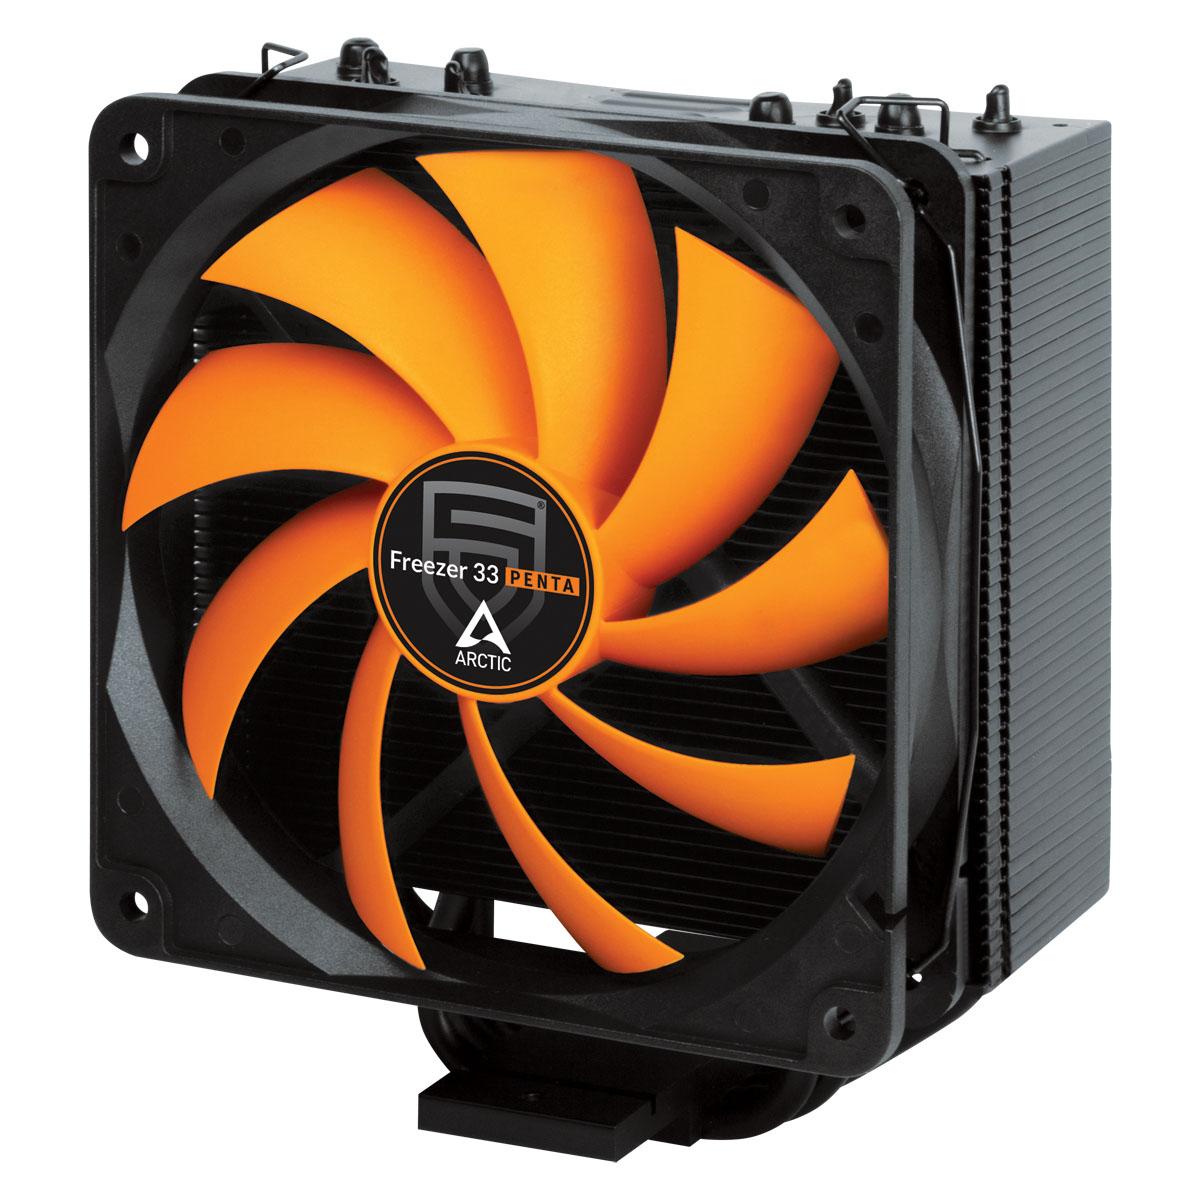 ARCTIC Freezer 33 PENTA, CPU Cooler for Intel 2011-v3/1150/1151/1155/1156/2066, AMD socket AM4, direct touch technology